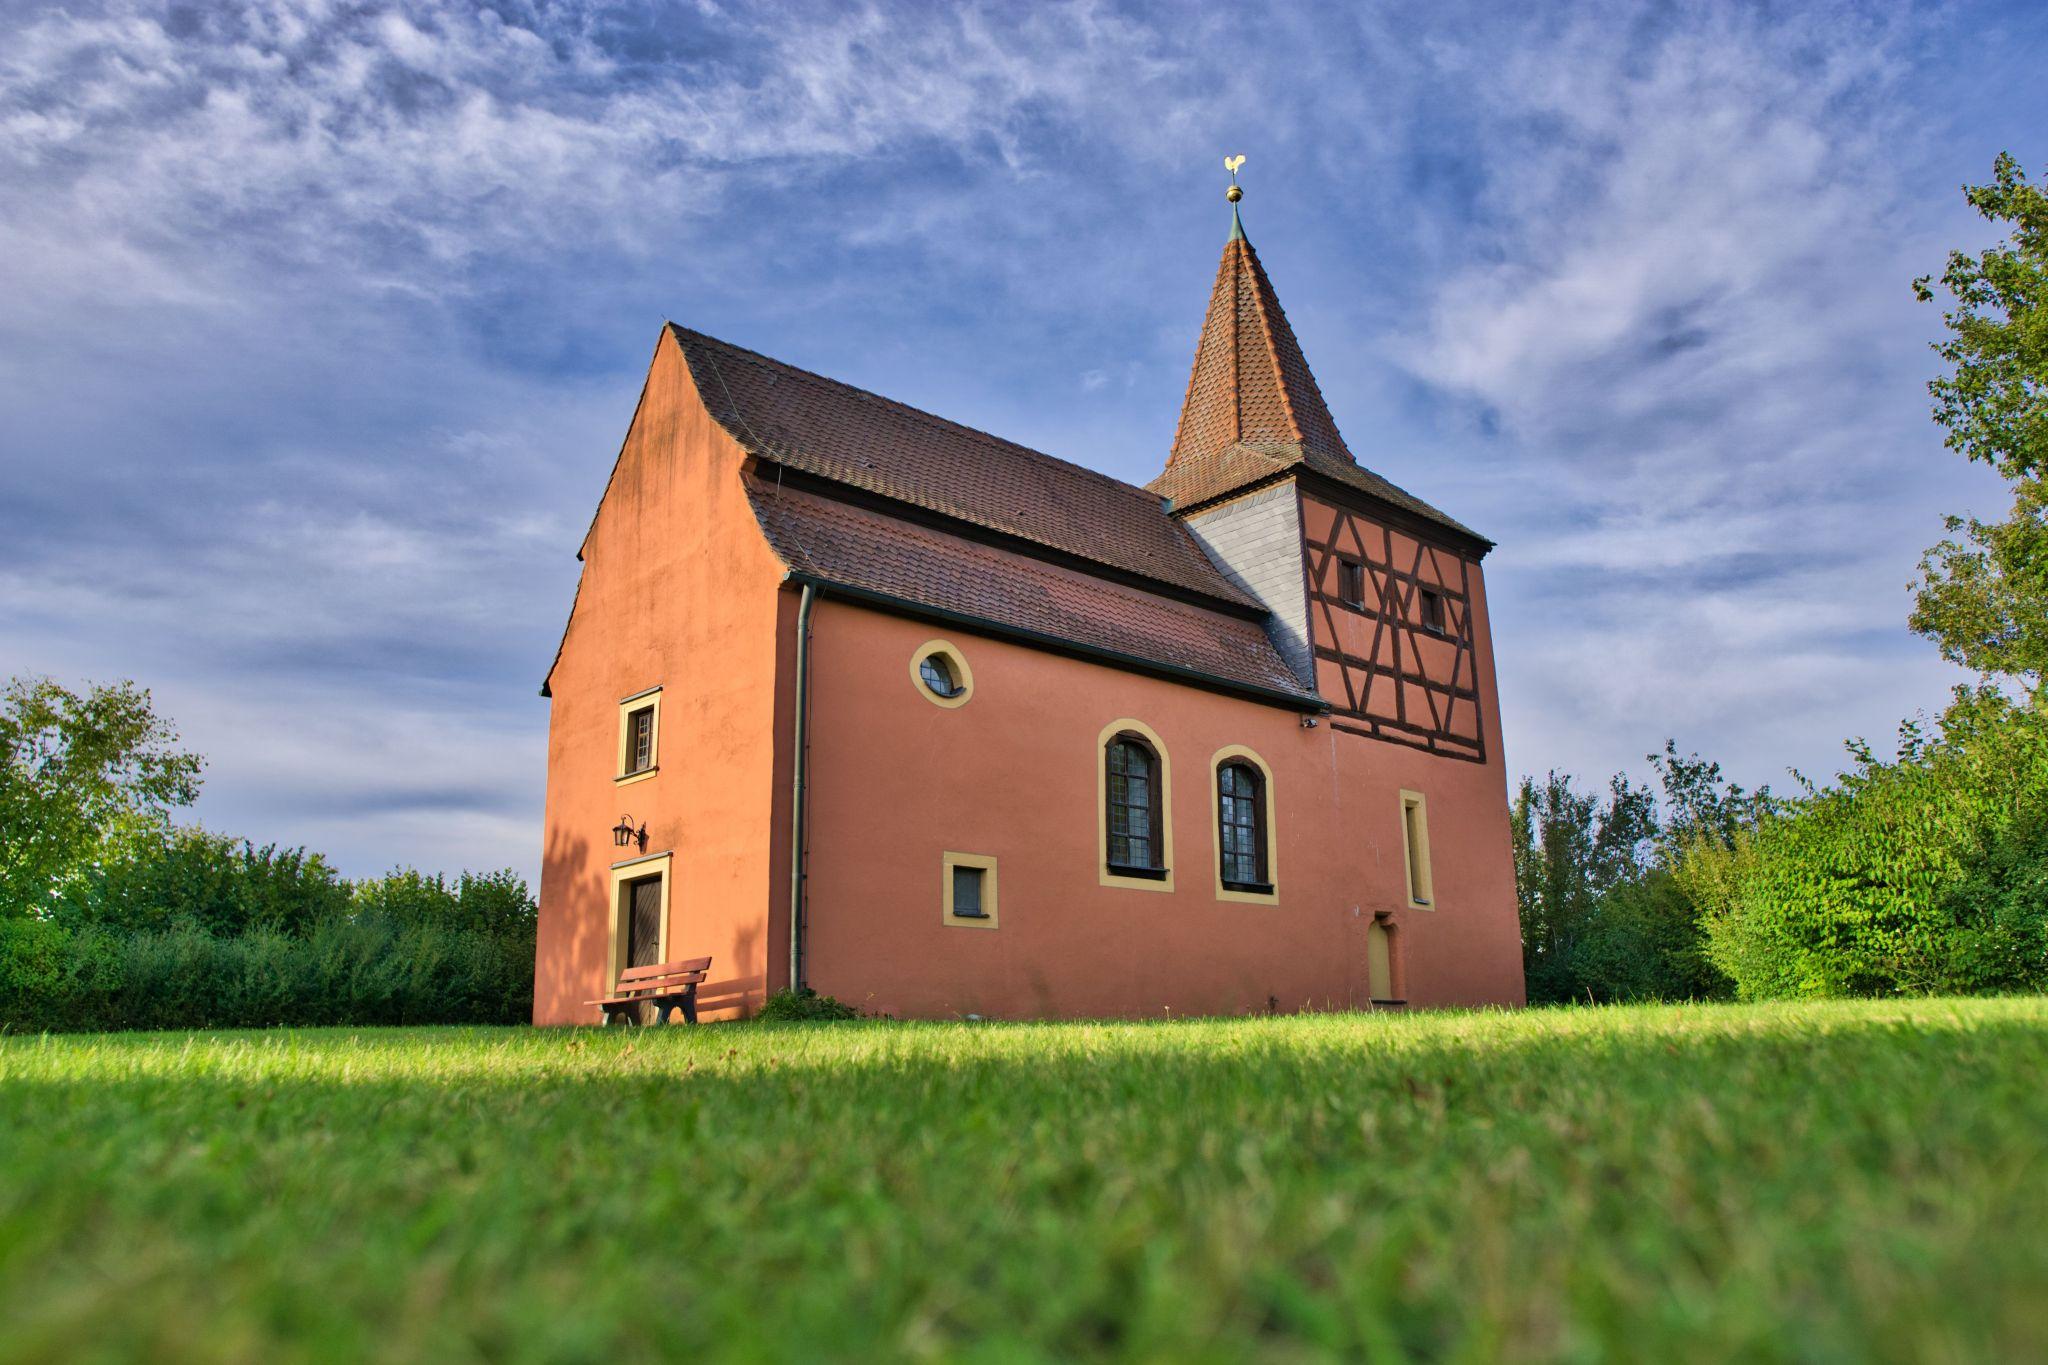 Mauritiuskirche Burghaslach, Germany